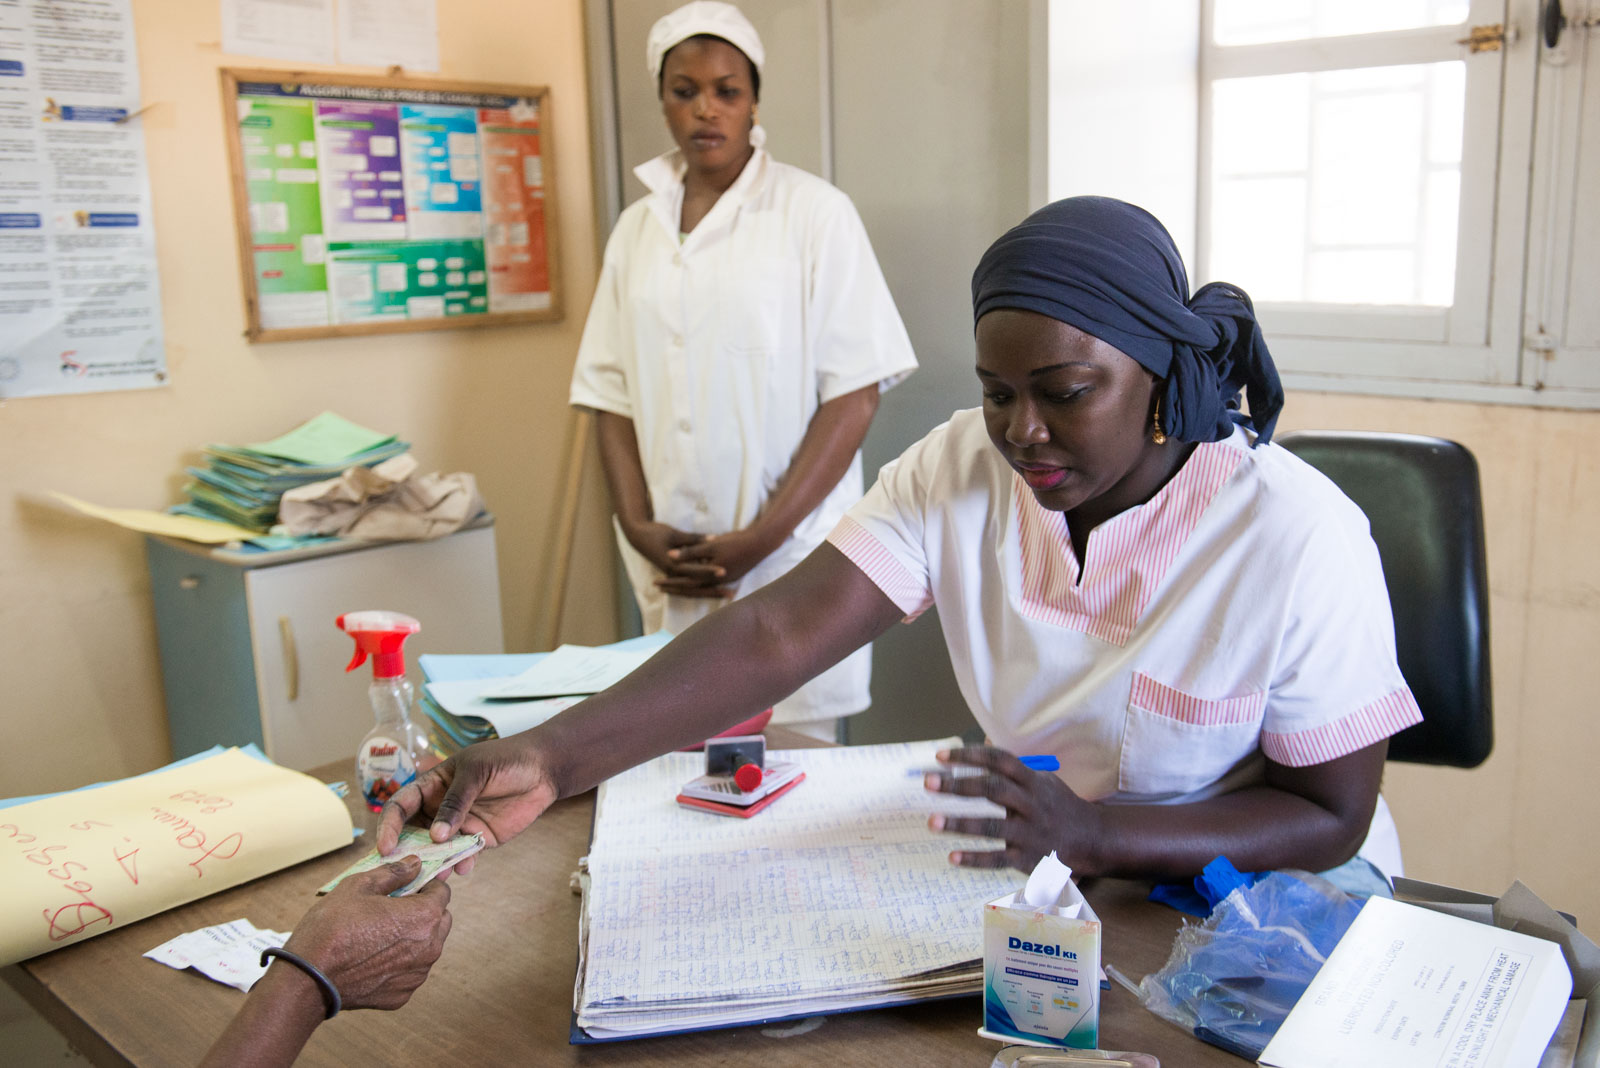 Chief midwife Penda Ba returns Awa's ID card following her mandatory check-up